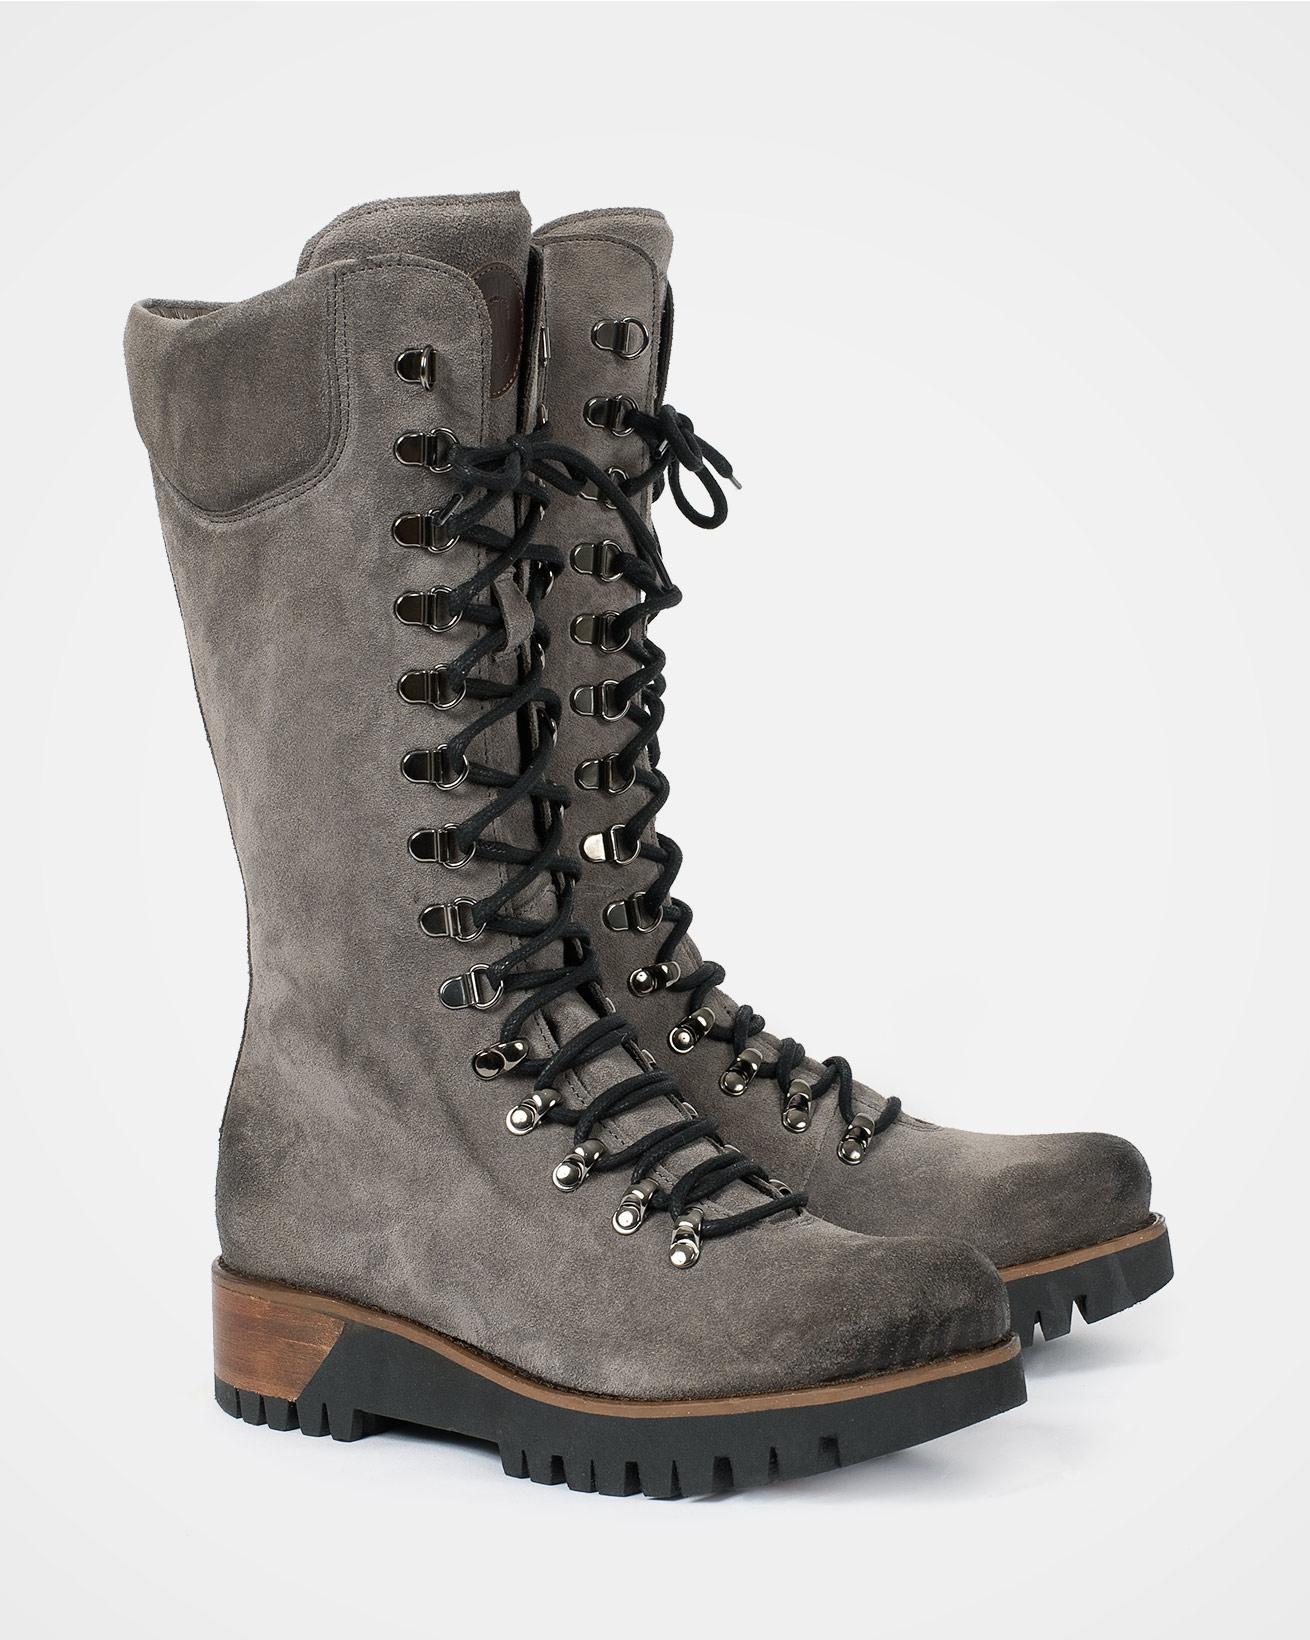 7082_wilderness-boots_grey_pair.jpg